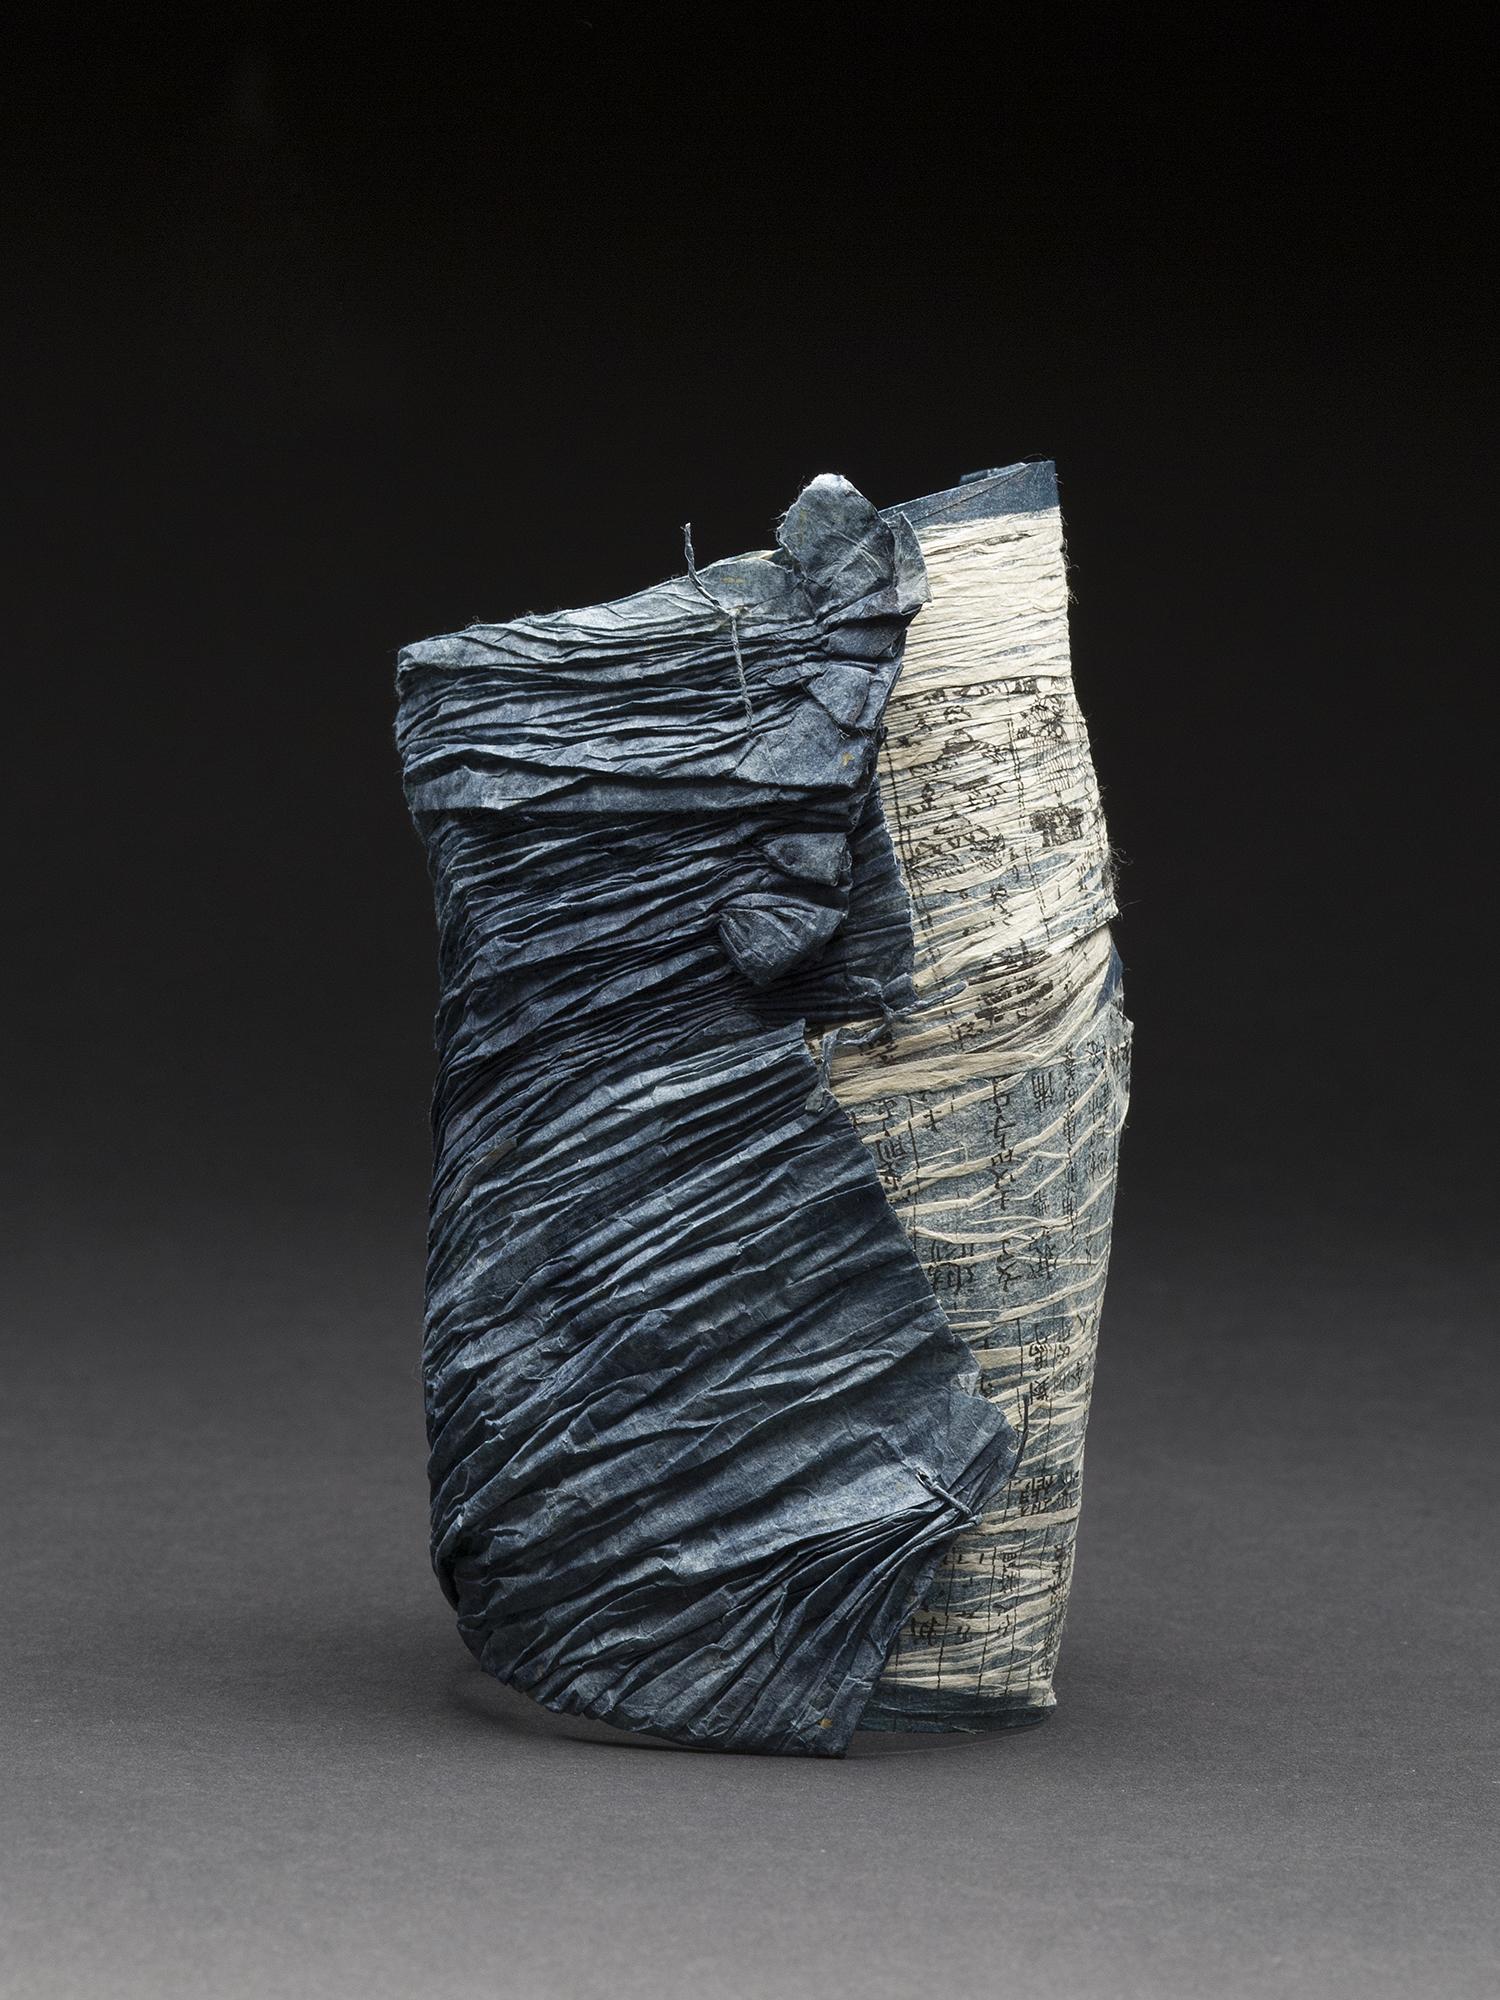 Yuko Kimura    Indigo Shiwa Shiwa No. 7  , 2014 Aquatint, indigo dye on old bookpages and kozo handmade paper, paper thread, Konnyaku ( devil's tongue root starch) 5 x 3 x 2 inches 12.7 x 7.6 x 5.1 cm YuK 29